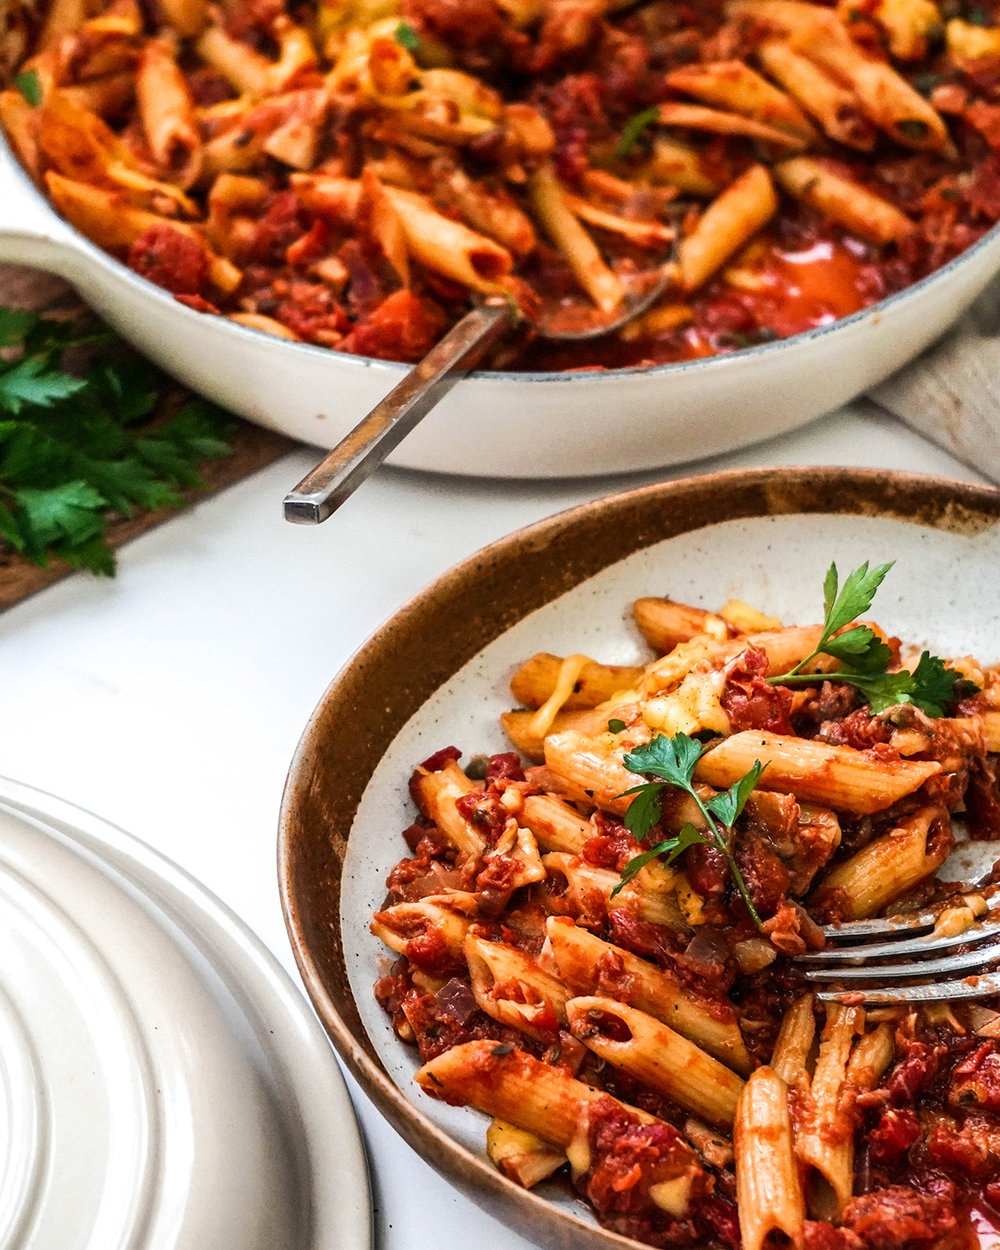 vegan tuna pasta bake - no tuna just vegetables!